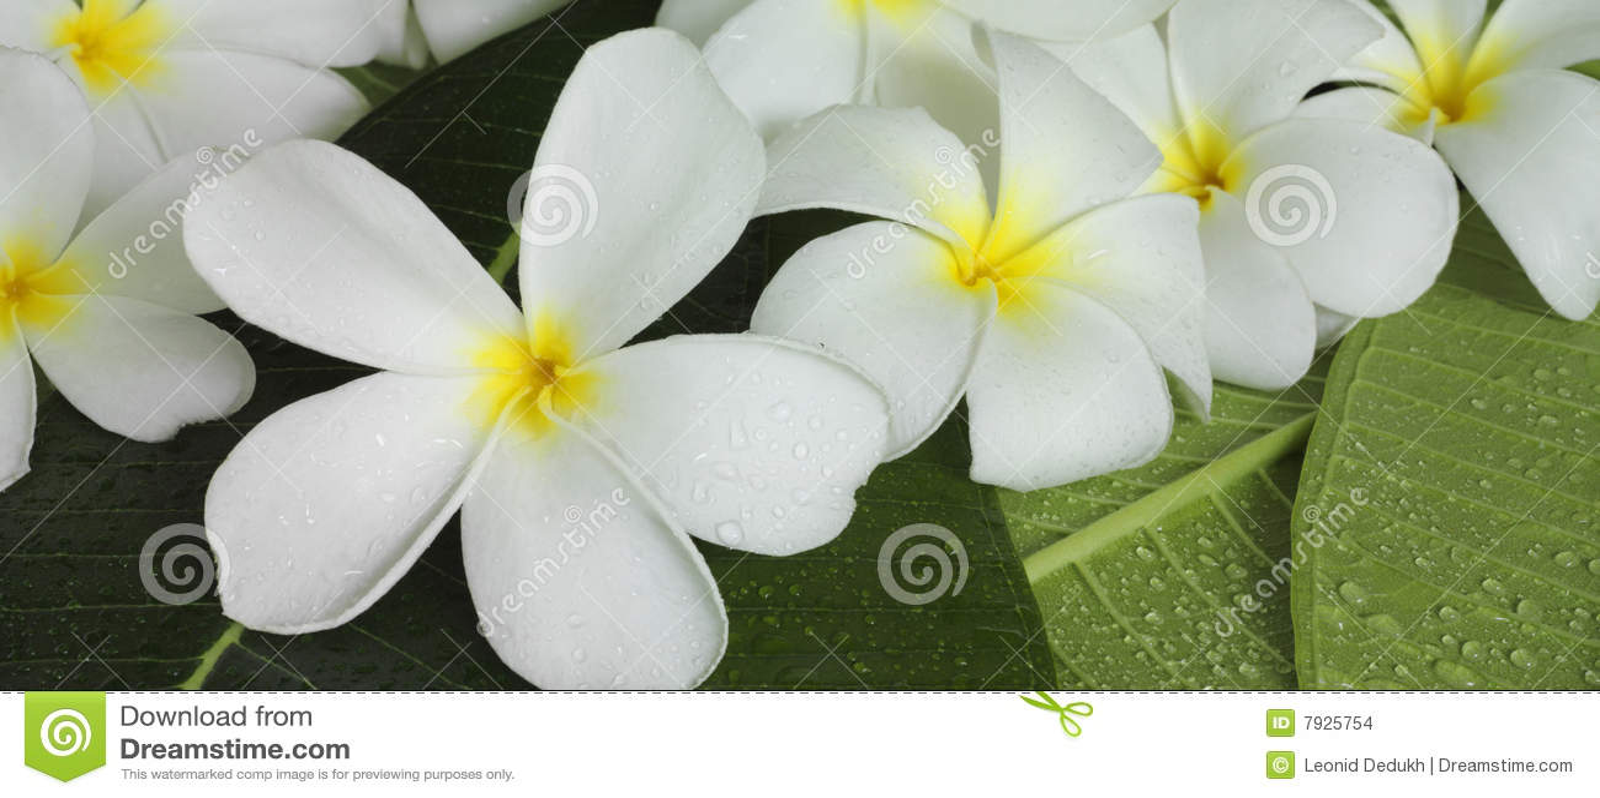 flores tropicales exoticas images. Black Bedroom Furniture Sets. Home Design Ideas